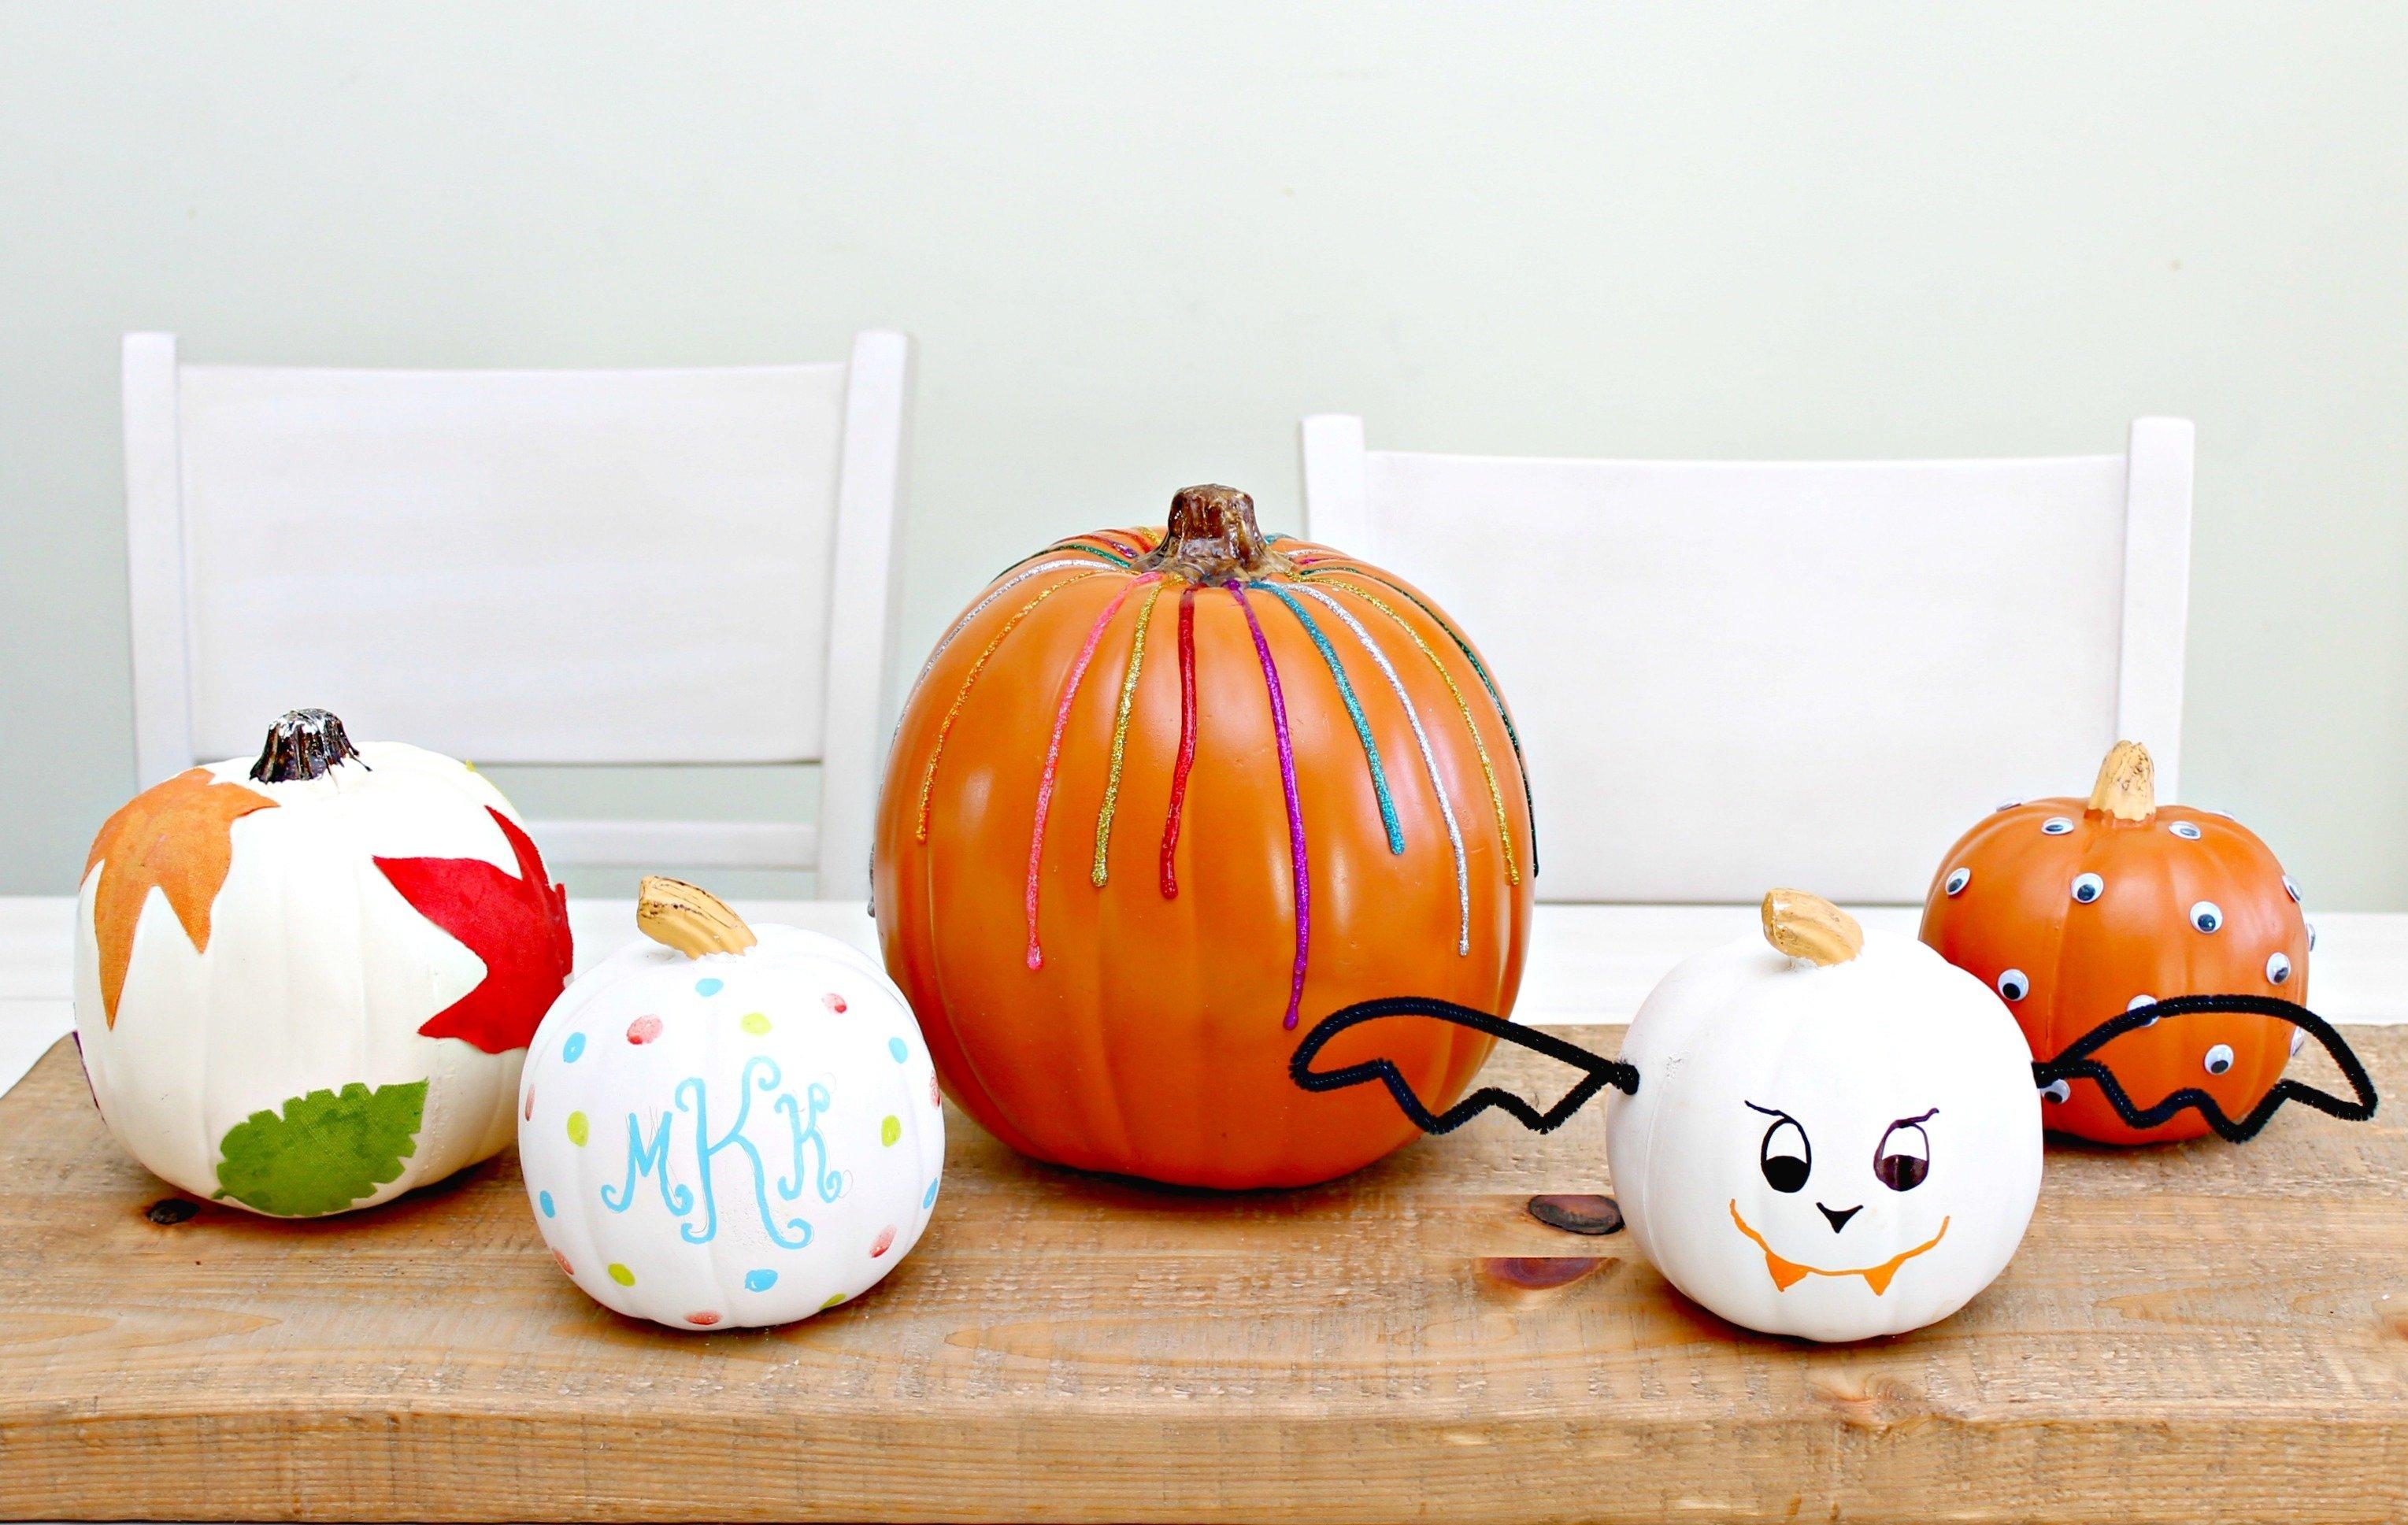 10 Beautiful Pumpkin Decorating Ideas No Carve no carve pumpkin decorating ideas mom 4 real 5 2020